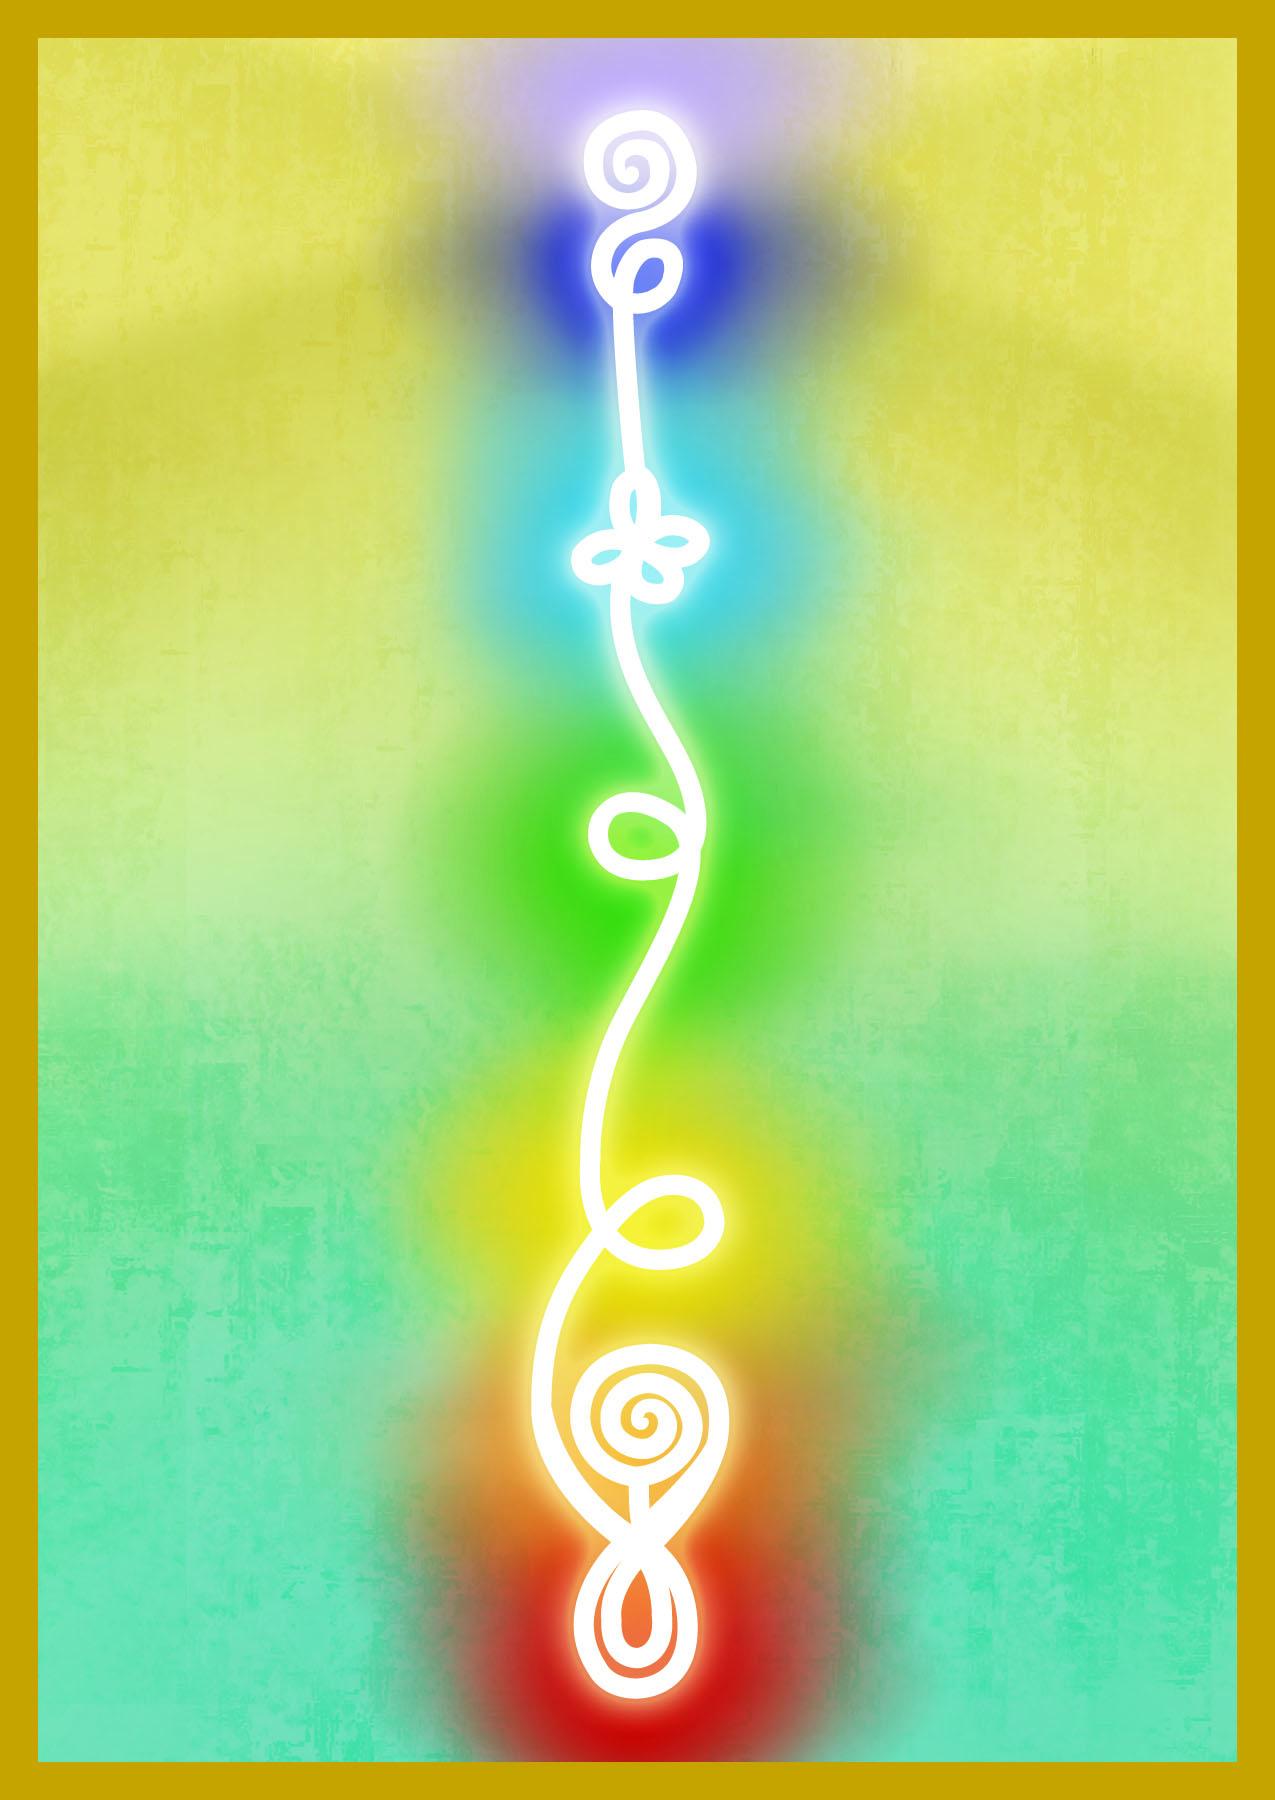 KU-CHA - CHAKRAKundalini ChakrasWhen the Goddess Kundalini has traveled up the spine to meet her Divine Mate, the union of Spirit and Matter are consummated.